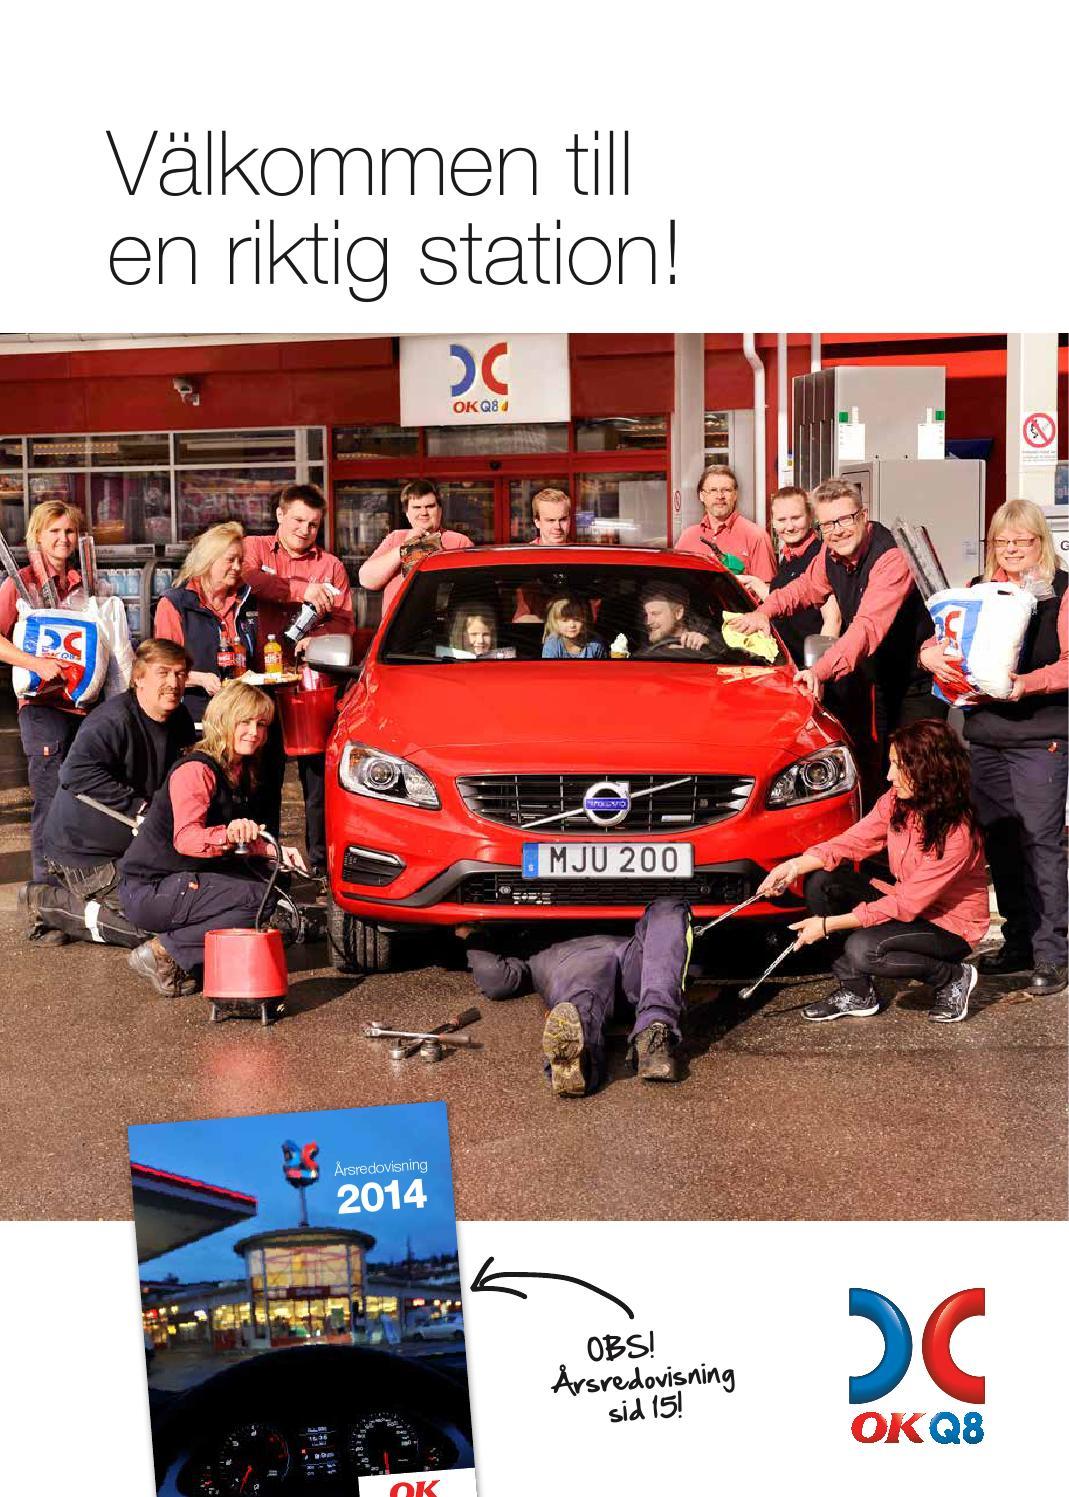 Inredning ok hyra lastbil : Tidningen 7 OKQ8 Bilaga by 7an Mediapartner - issuu